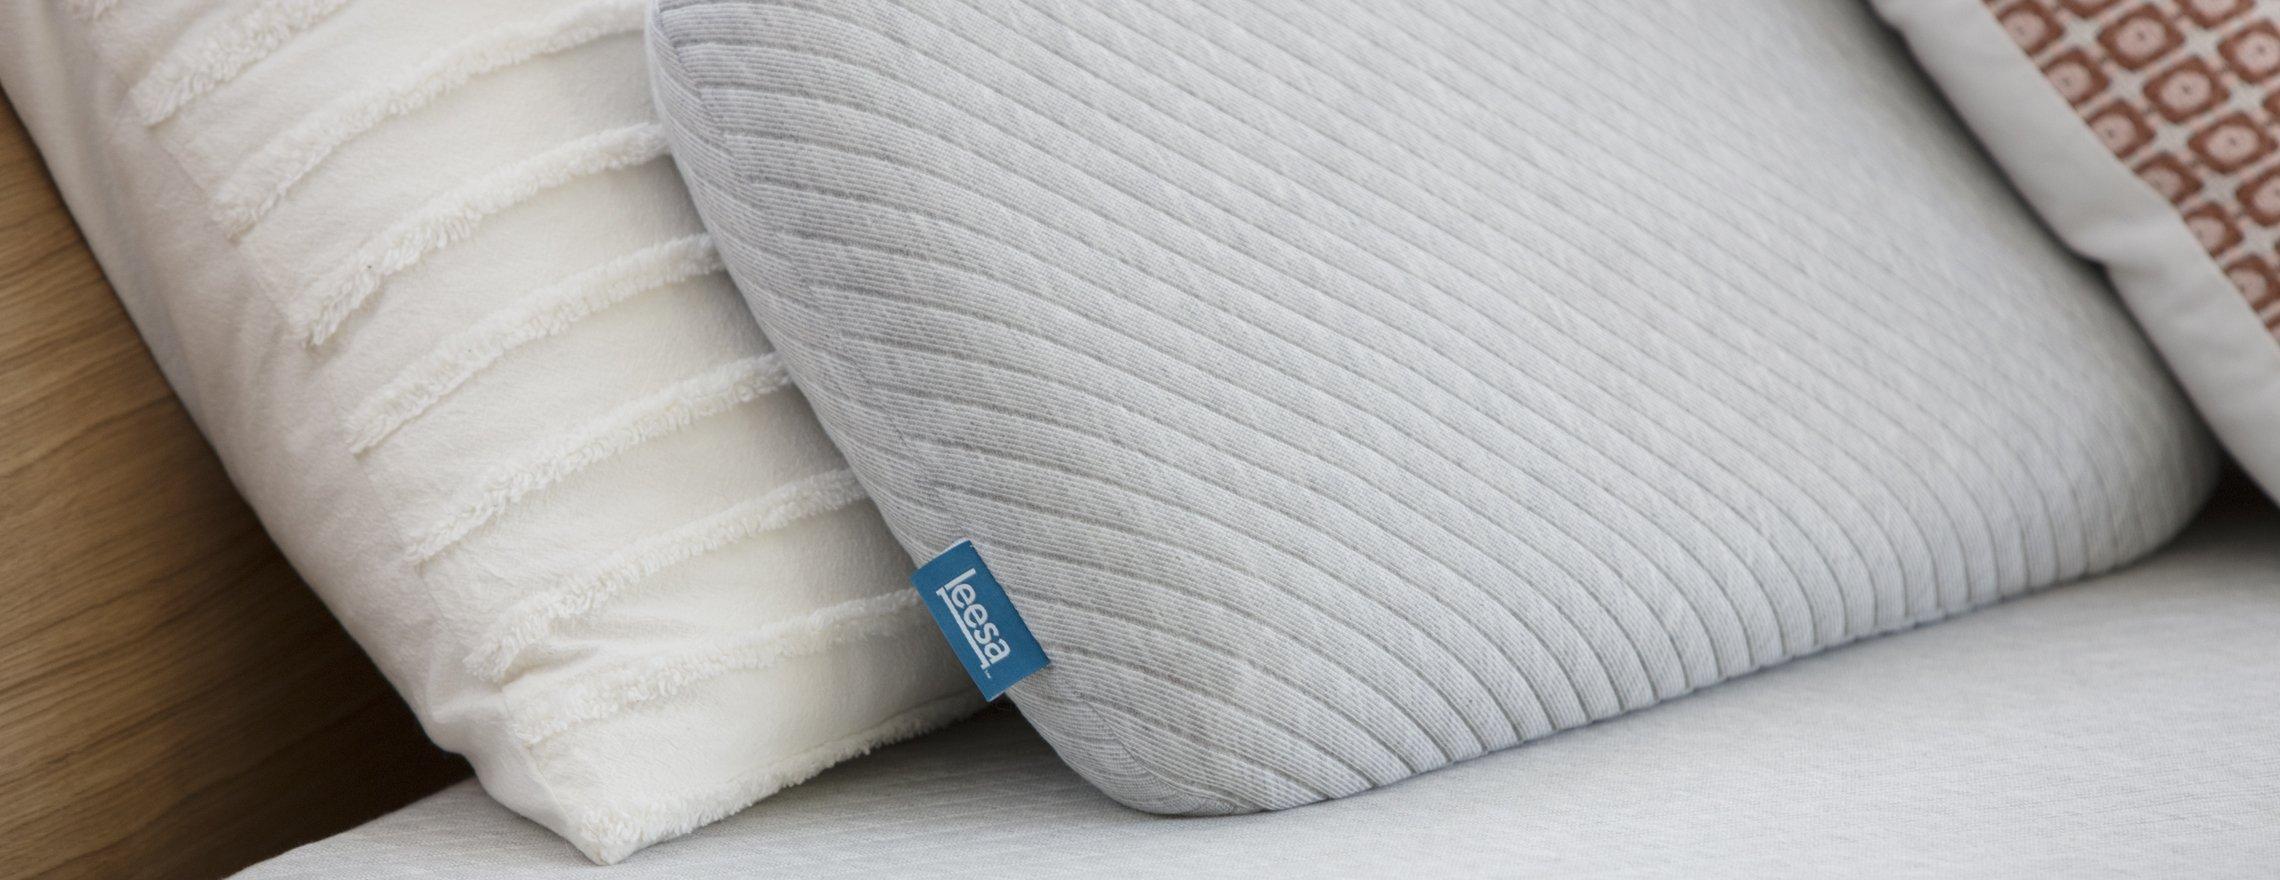 two_leesa_pillows_white_and_gray